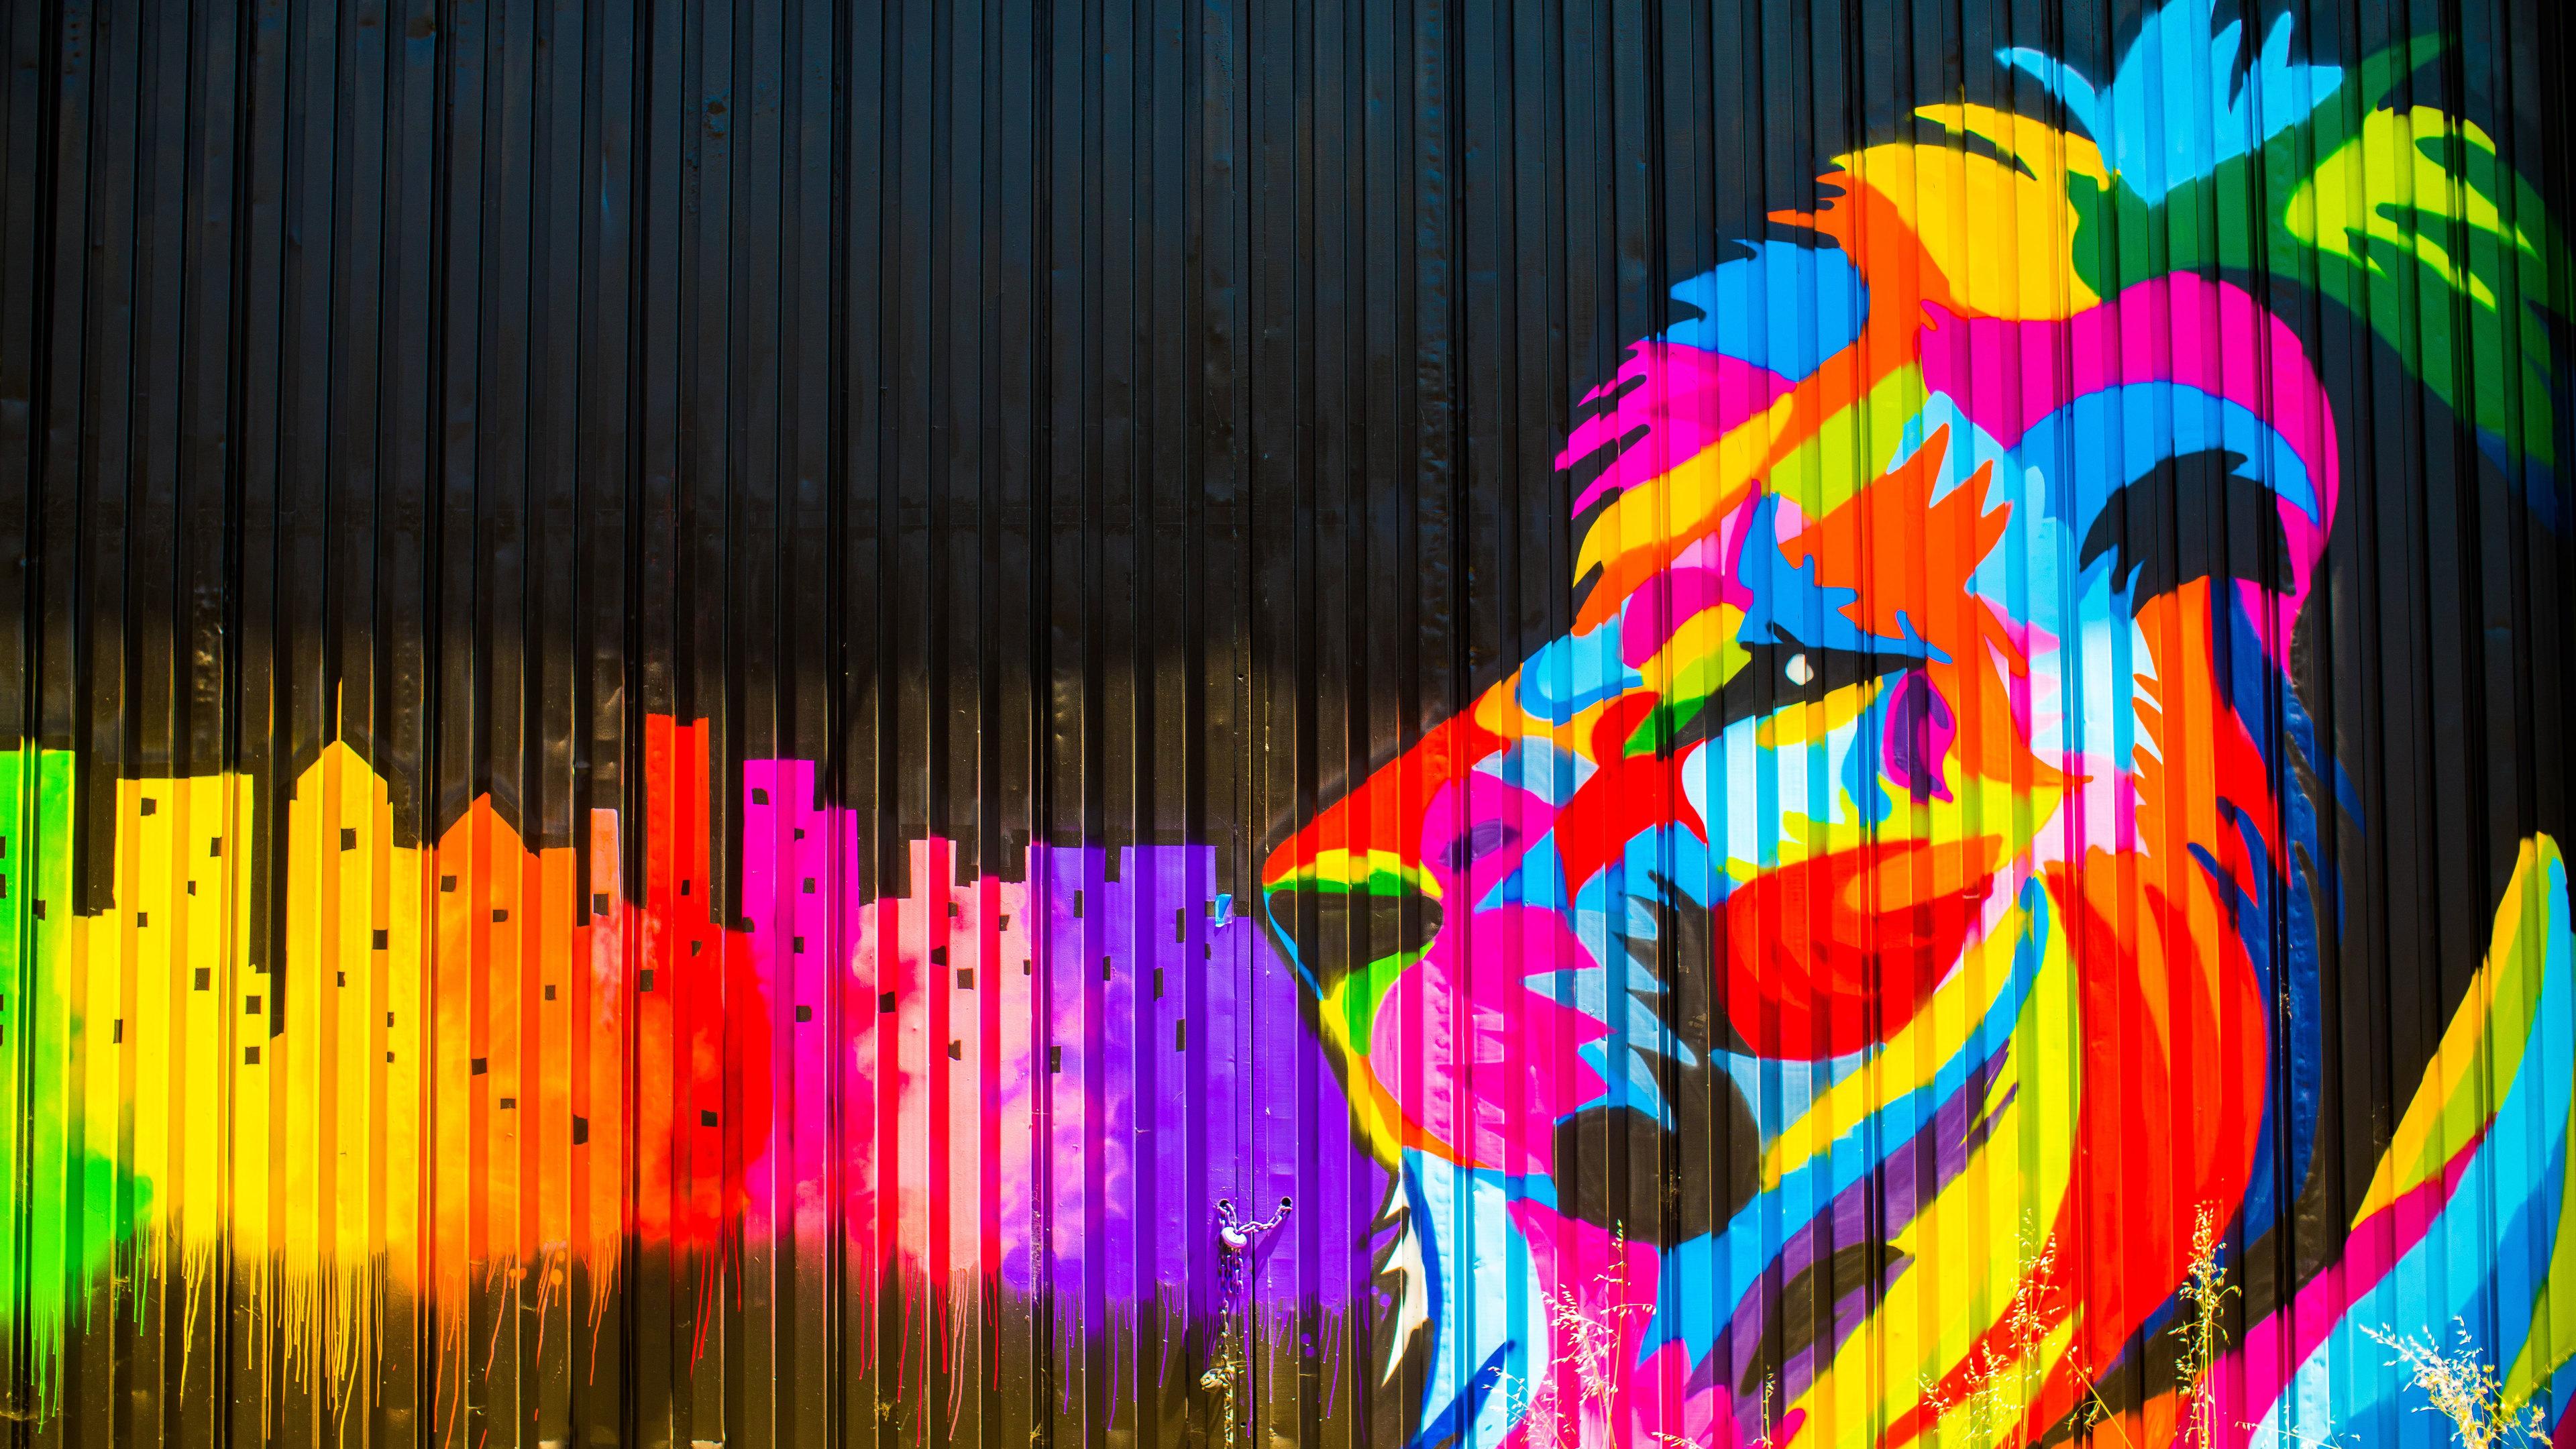 lion graffiti 4k 1540751393 - Lion Graffiti 4k - lion wallpapers, hd-wallpapers, graffiti wallpapers, digital art wallpapers, artwork wallpapers, artist wallpapers, 5k wallpapers, 4k-wallpapers